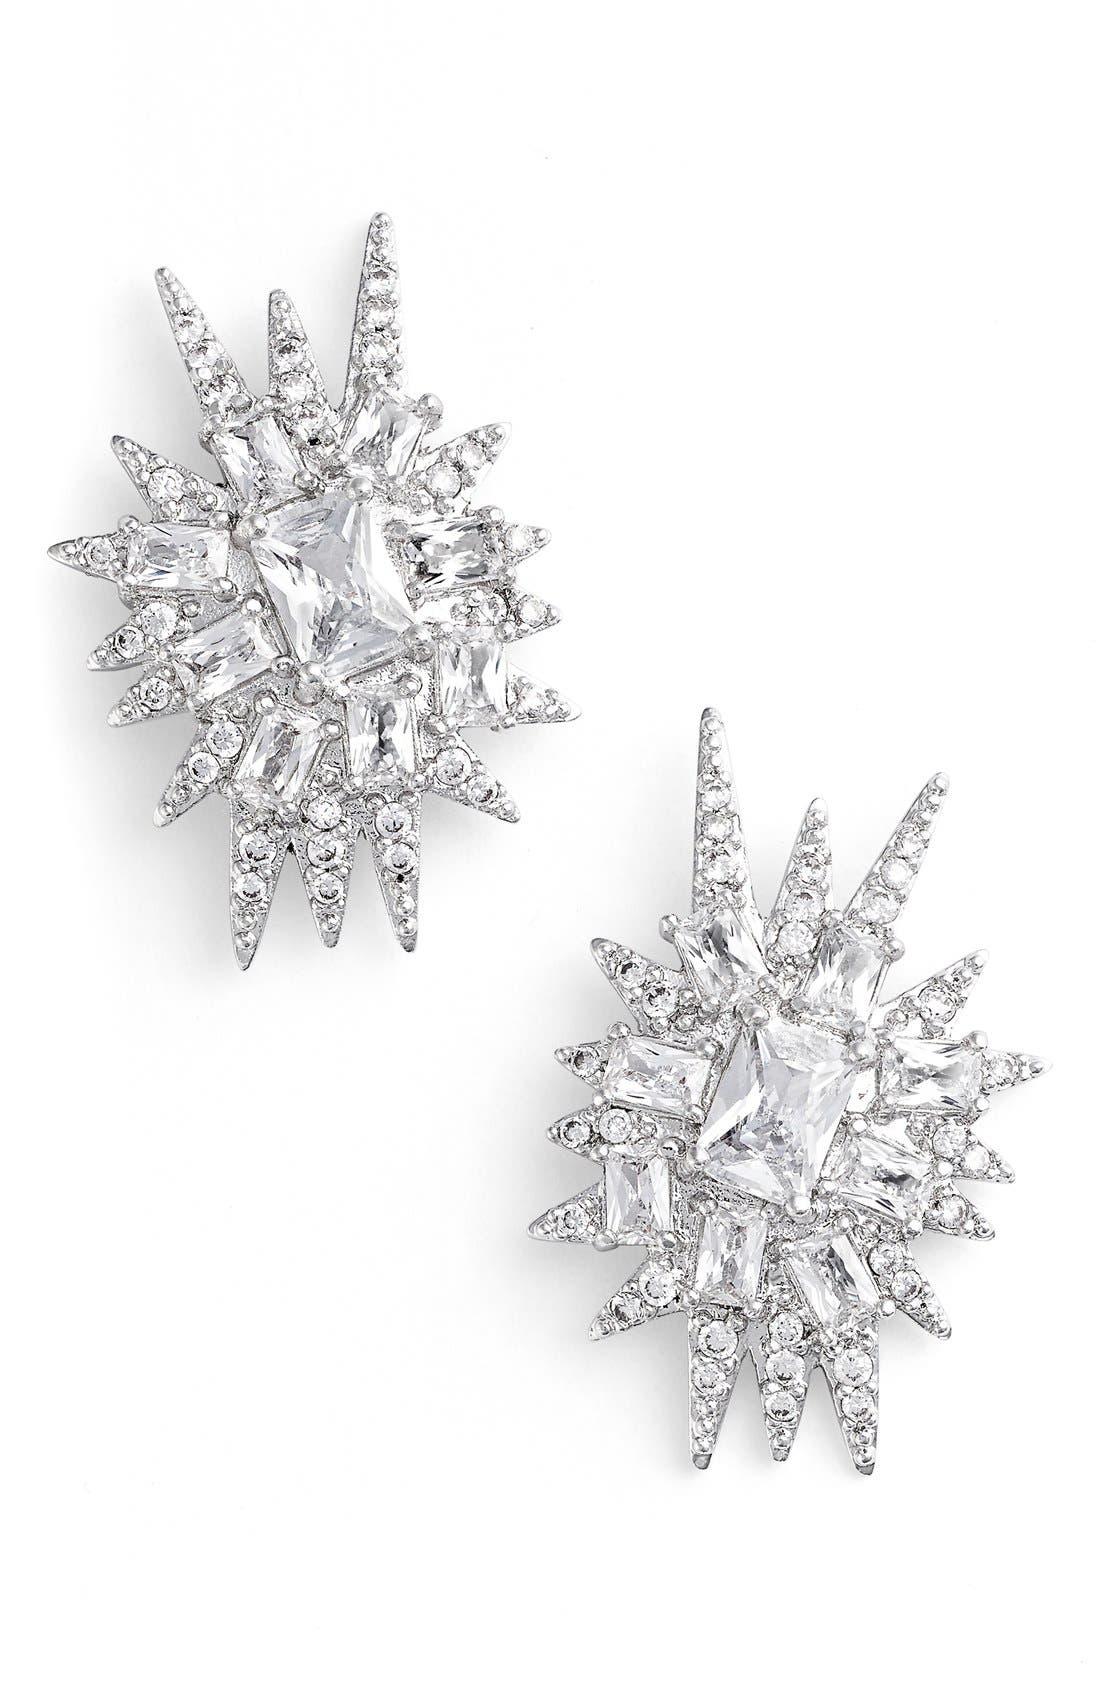 CZ by Kenneth Jay Lane 'Explosion' Cubic Zirconia Stud Earrings